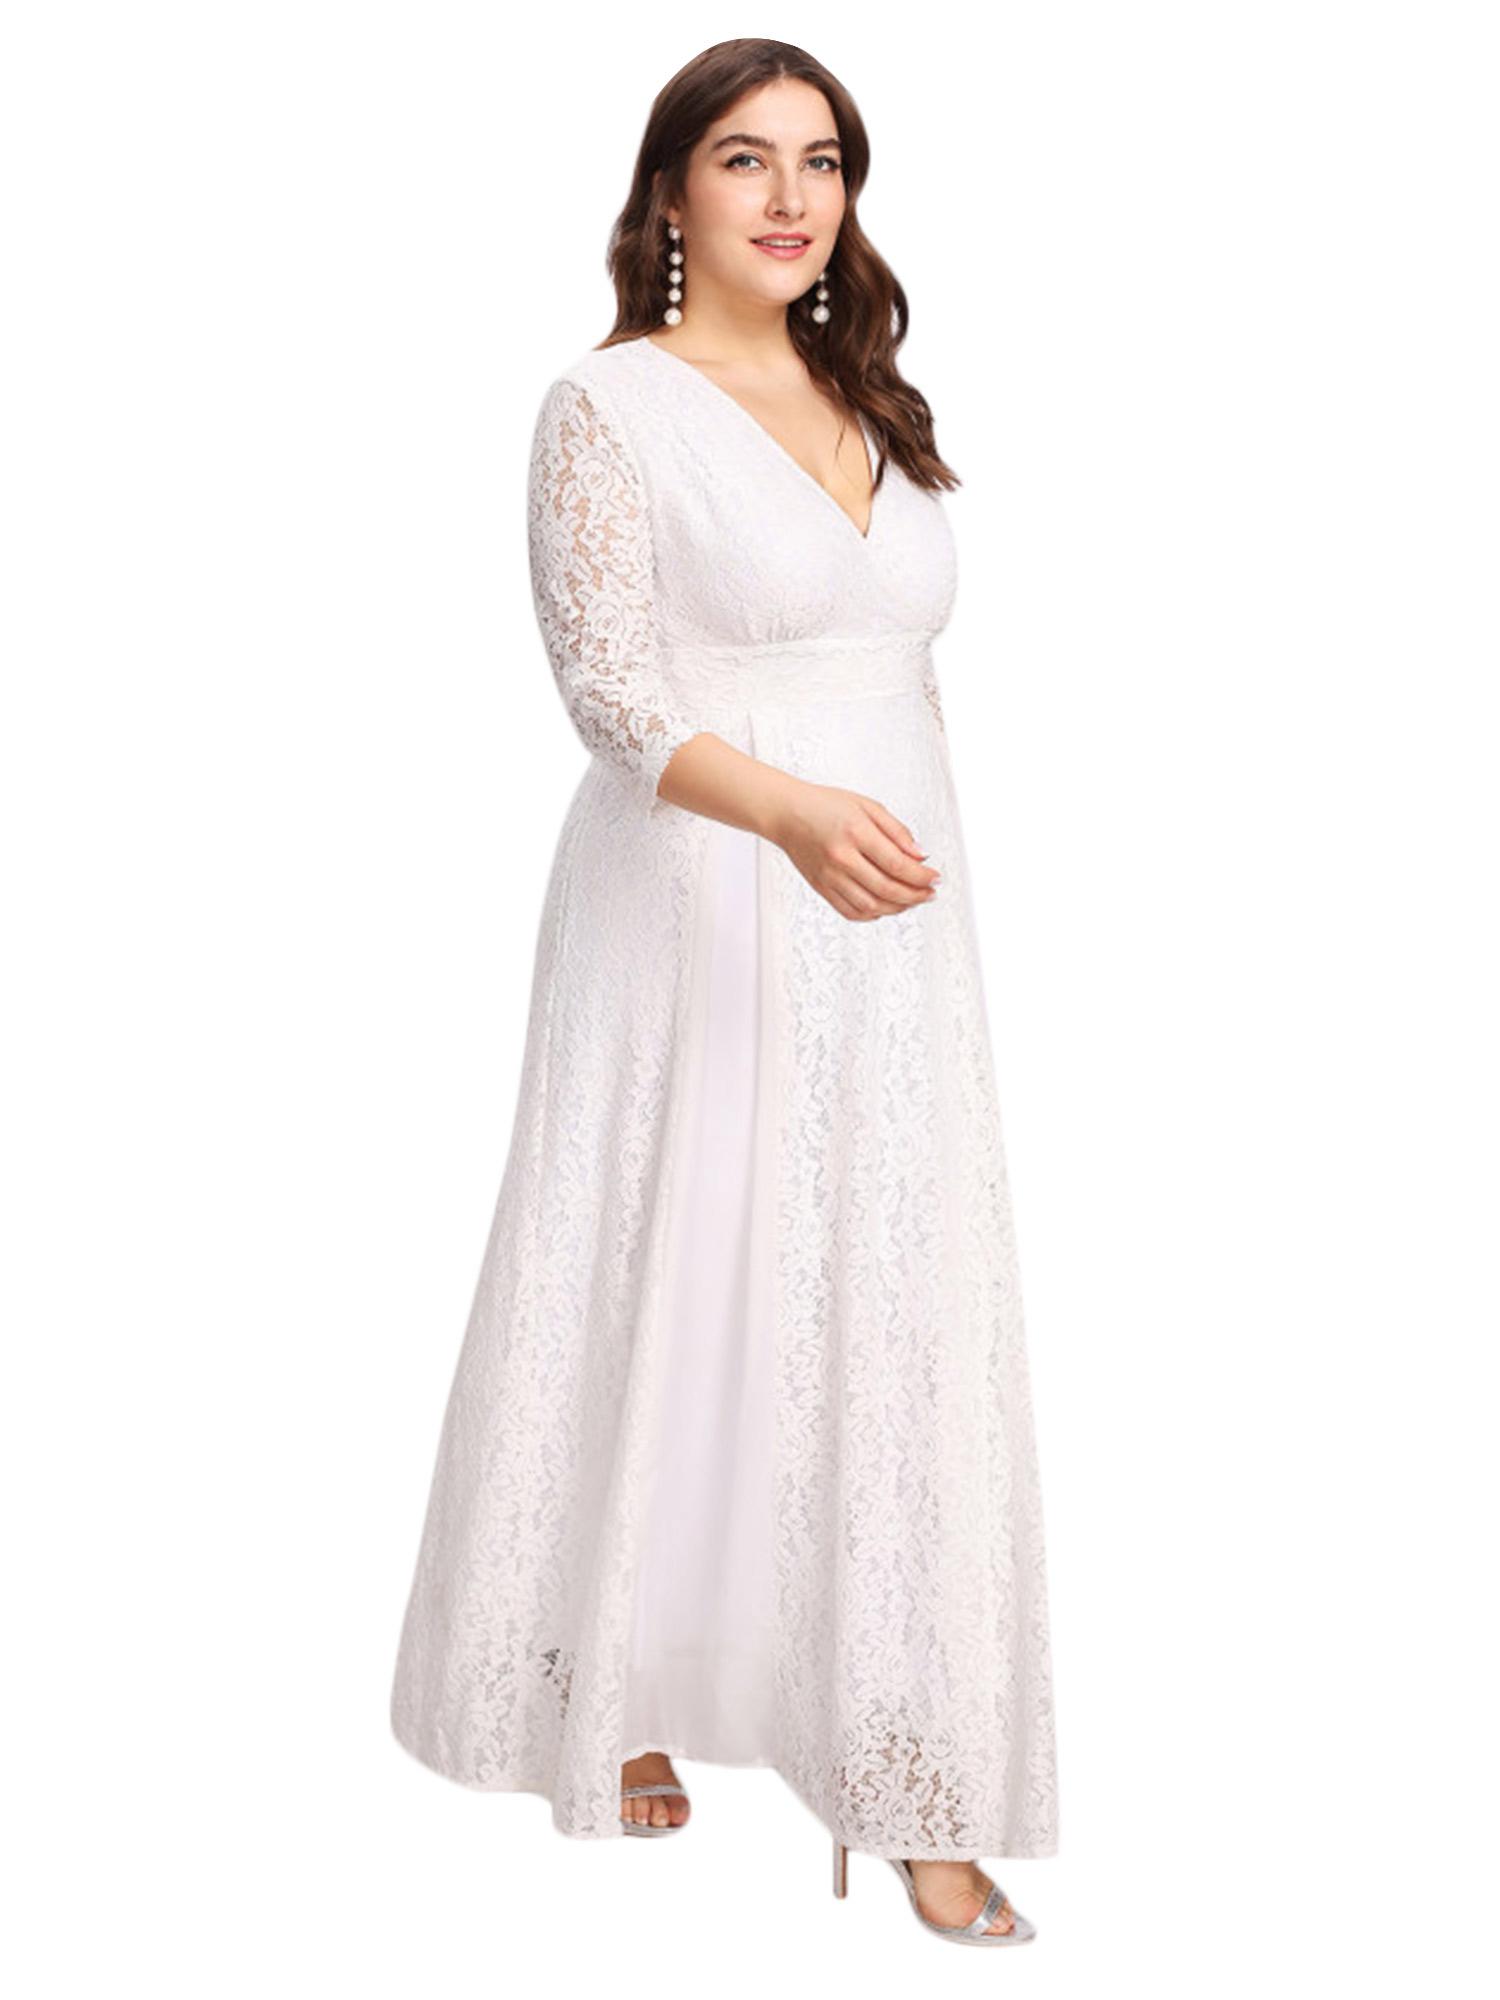 57a876519a Detail Feedback Questions about ESPRLIA Women s Plus Size High Waist ...